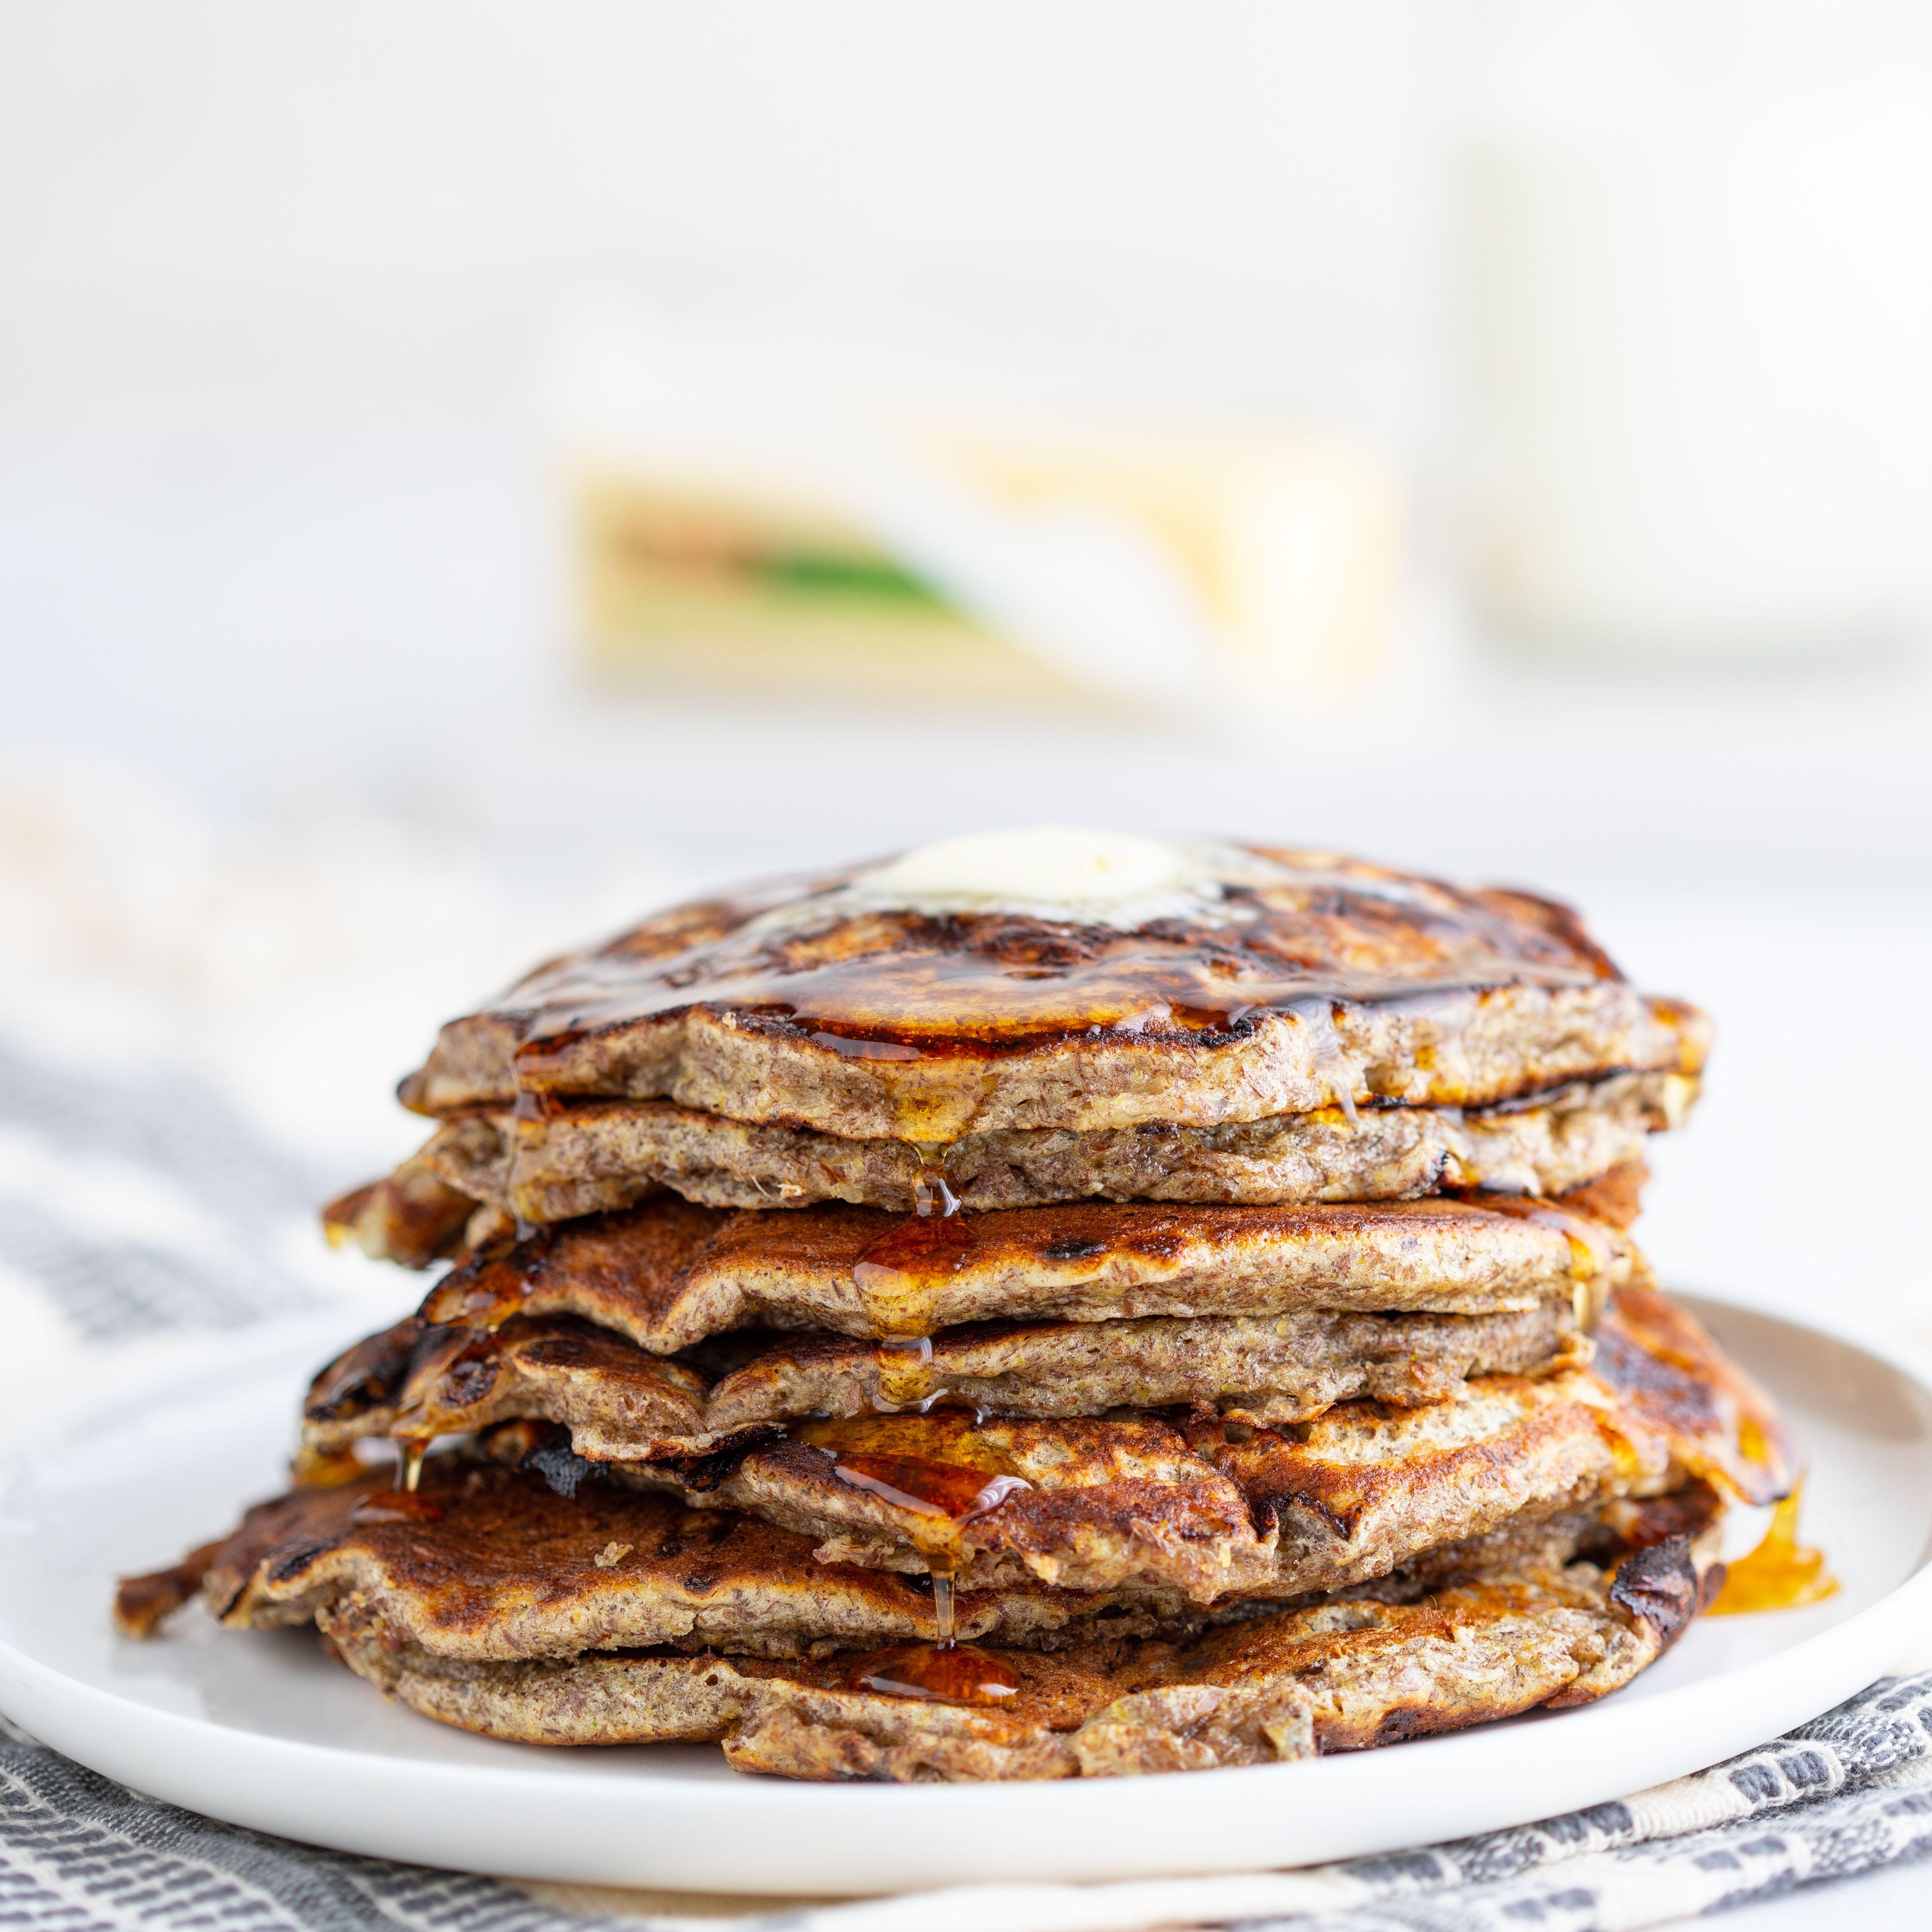 Cottage Cheese Pancakes Recipe Cheese Pancakes Cottage Cheese Recipes Cottage Cheese Pancakes